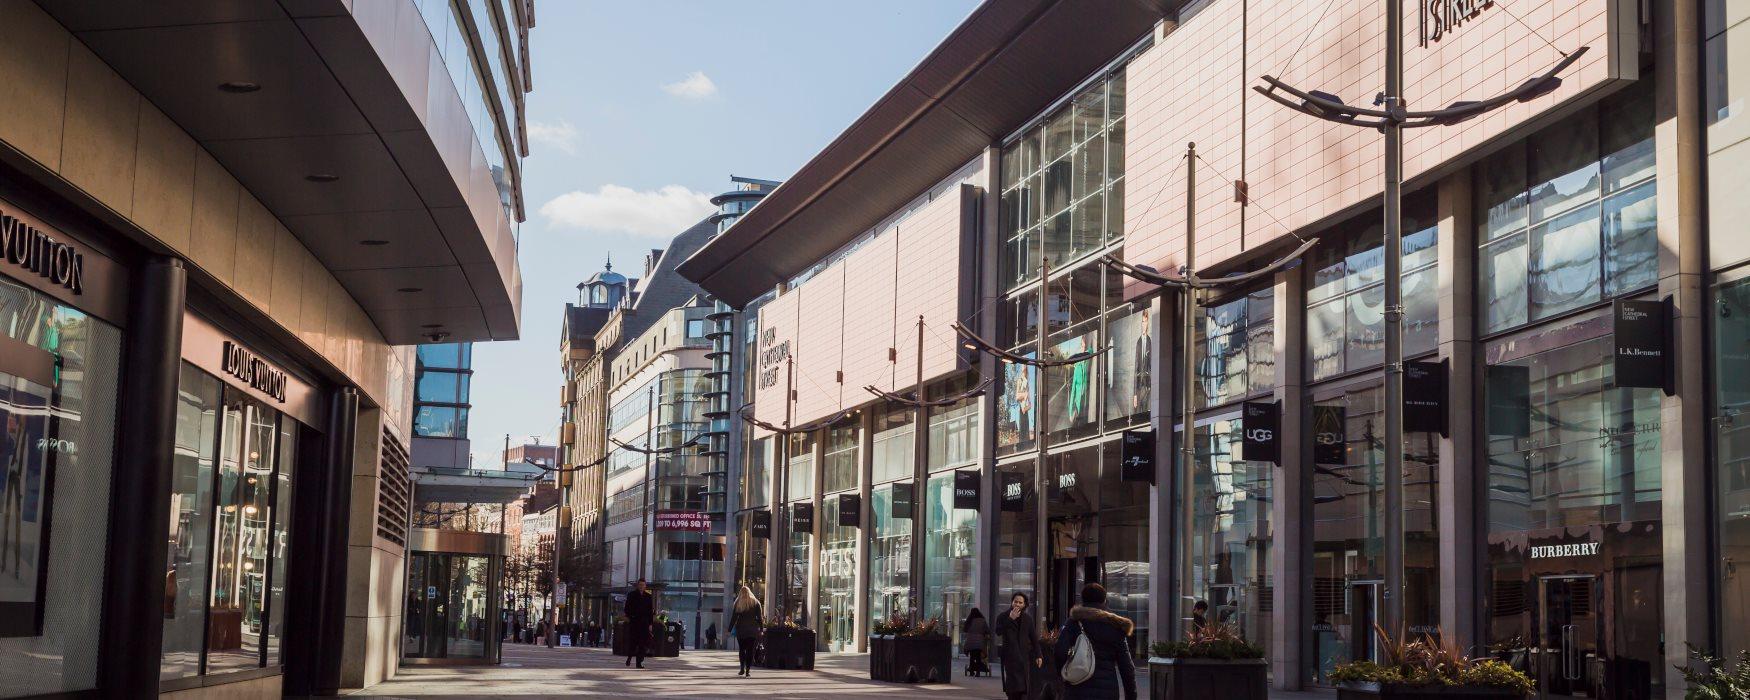 Central Retail District